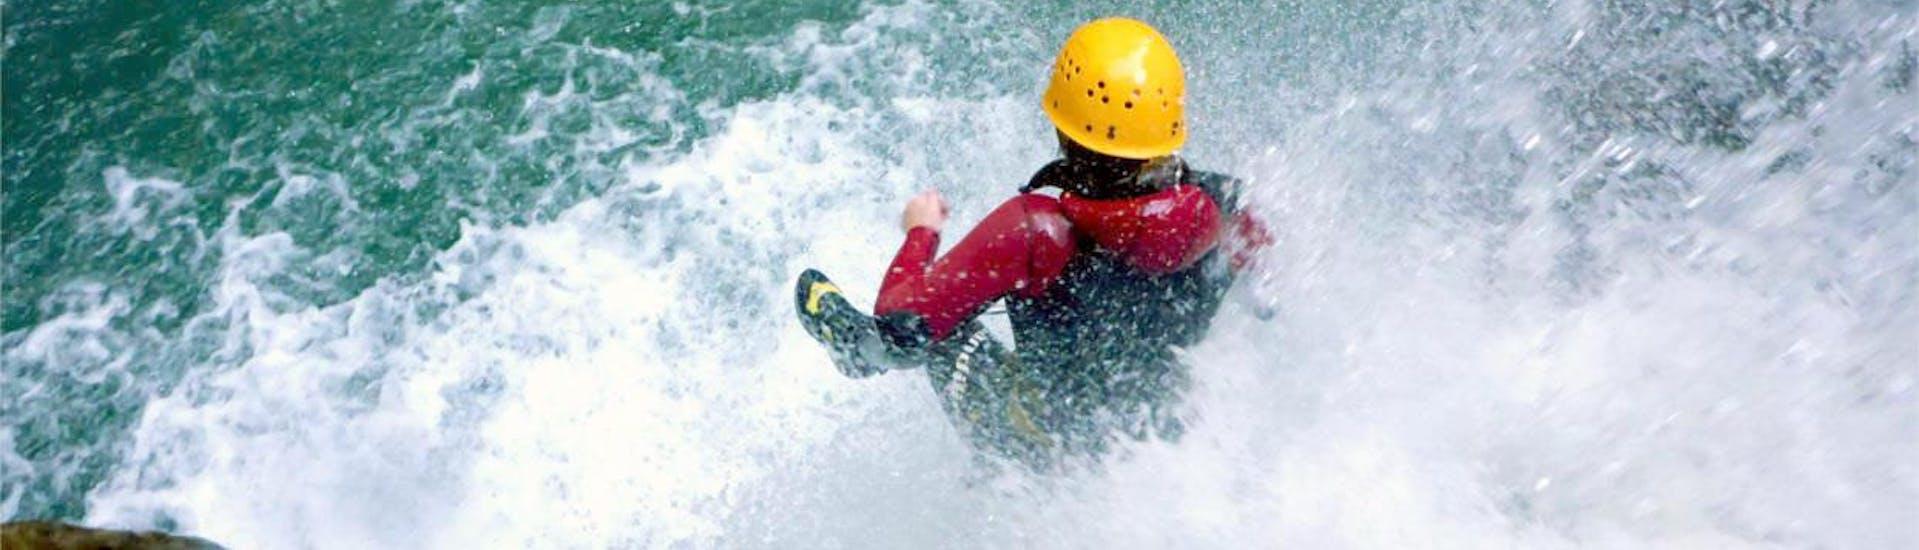 Canyoning Fun in Allgäu for Beginners & Experienced